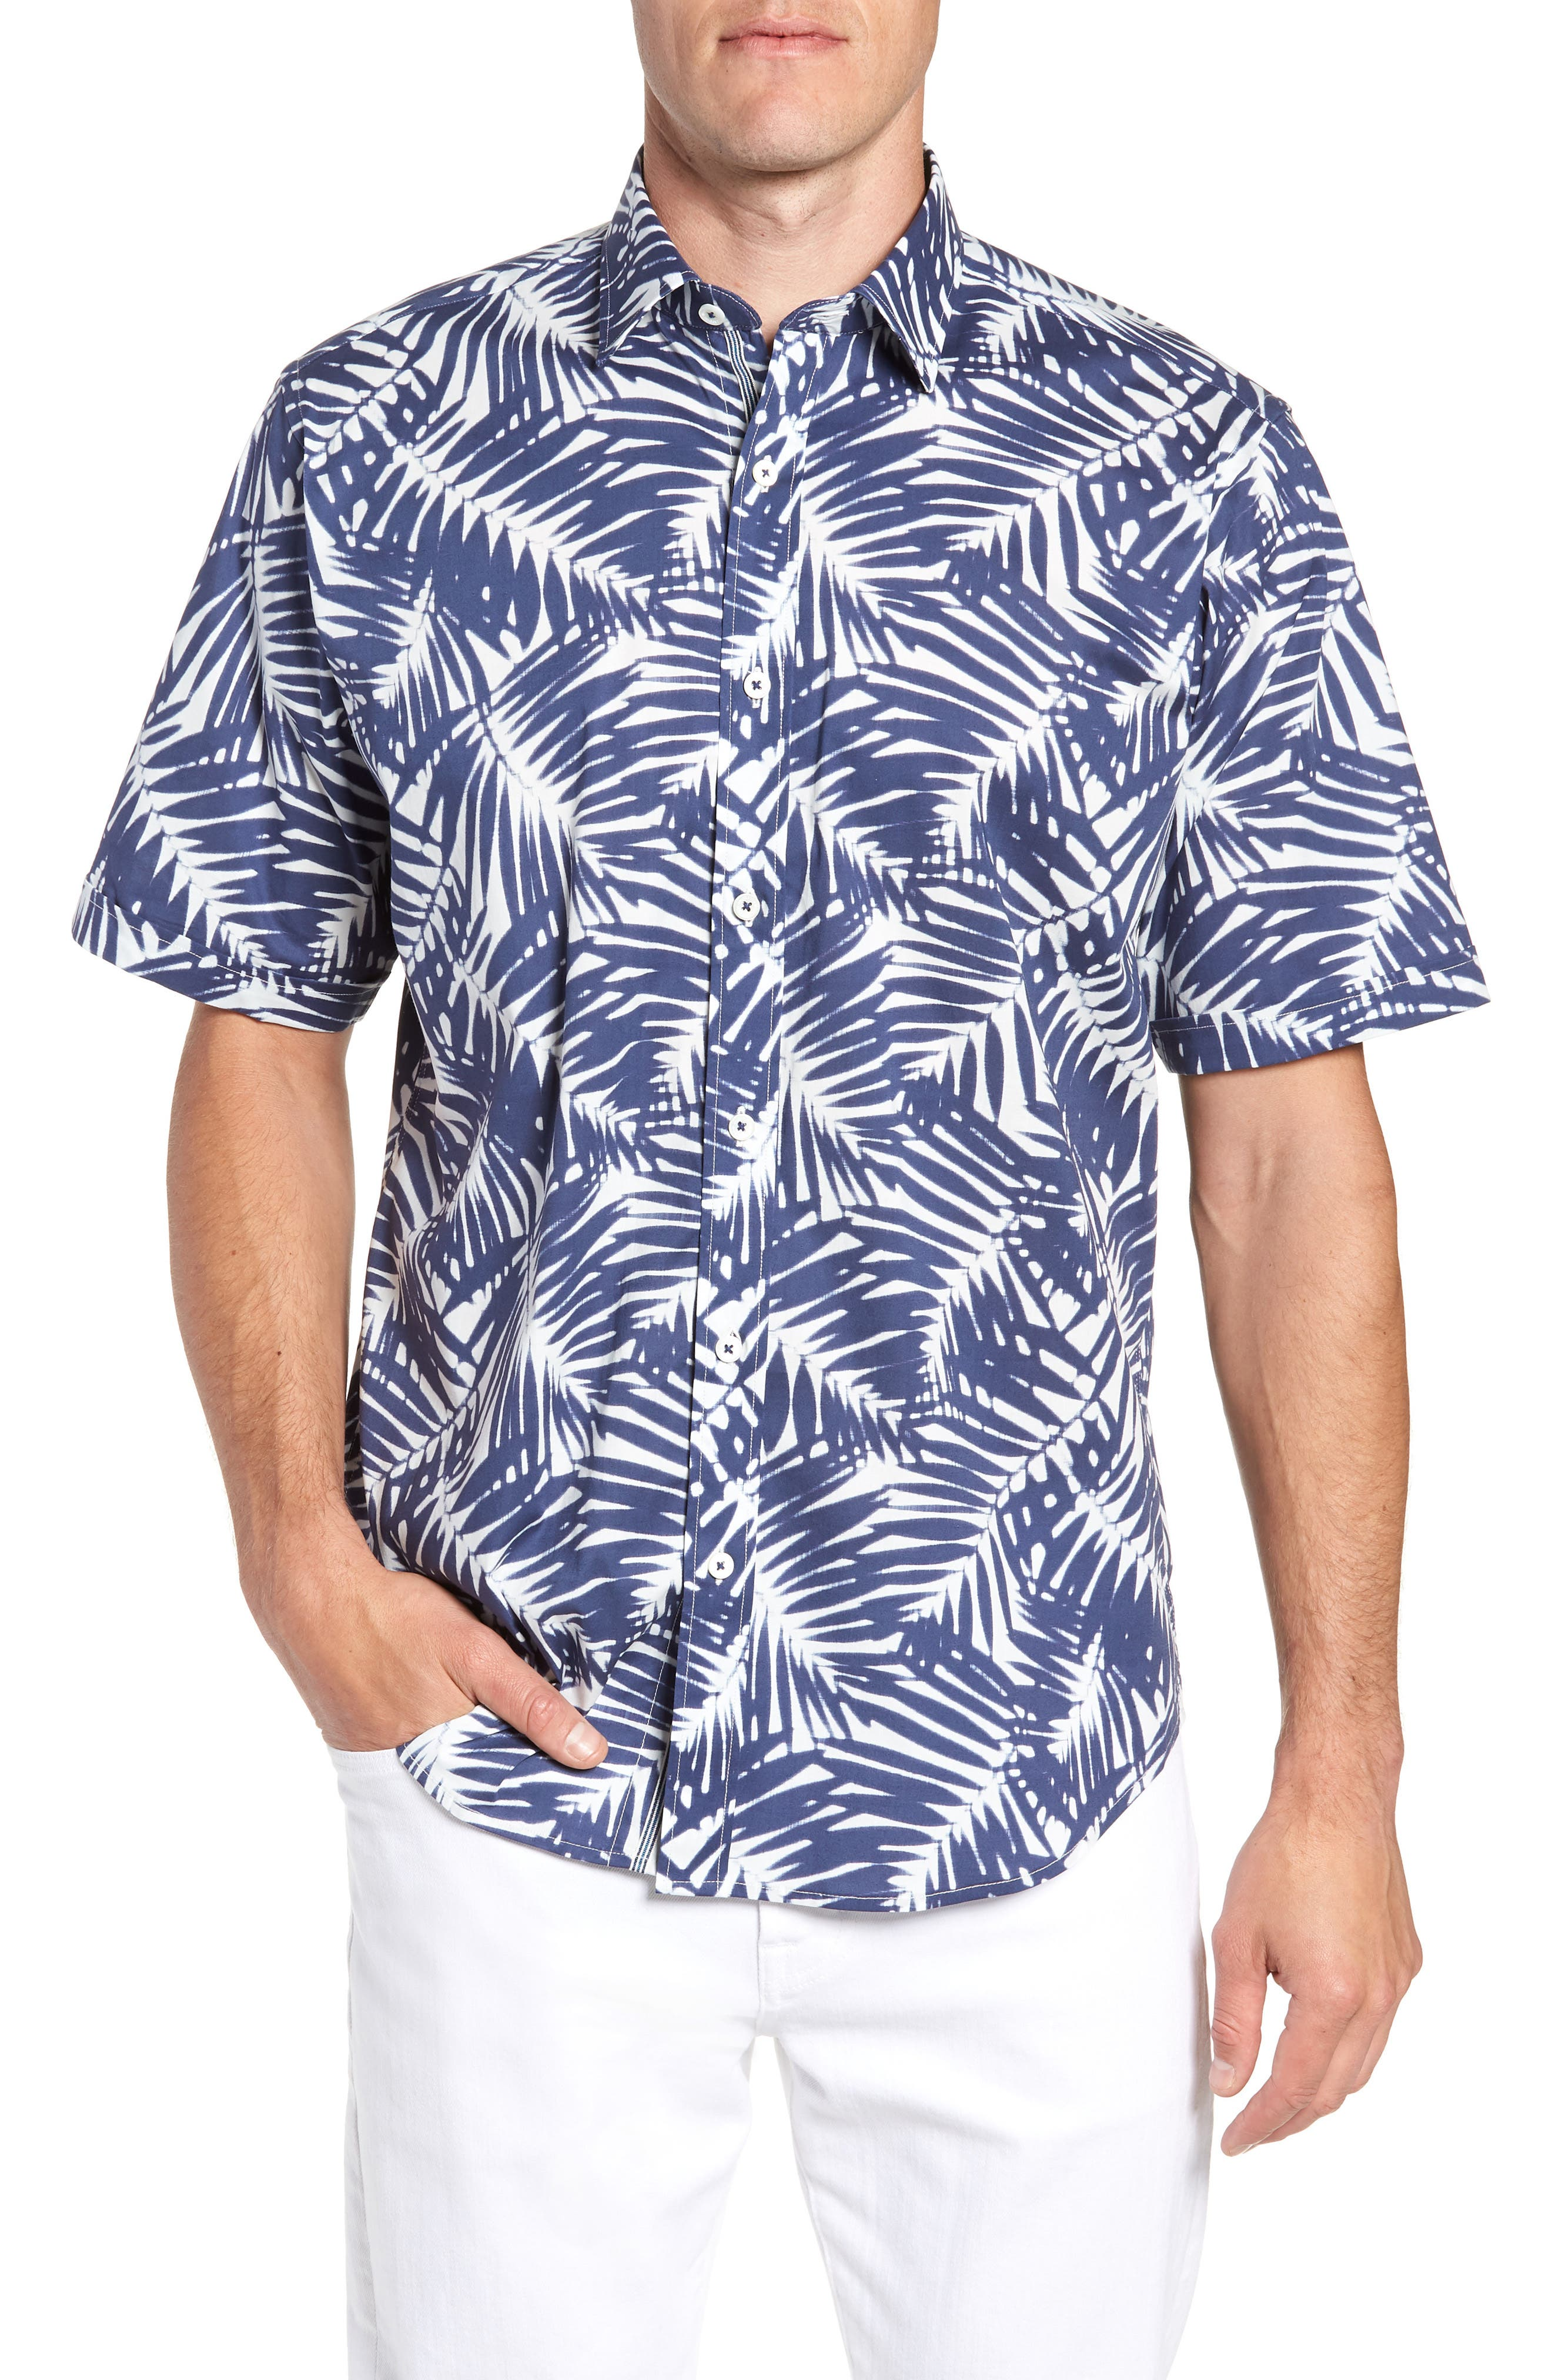 Indigo Palms Classic Fit Sport Shirt,                         Main,                         color, Navy